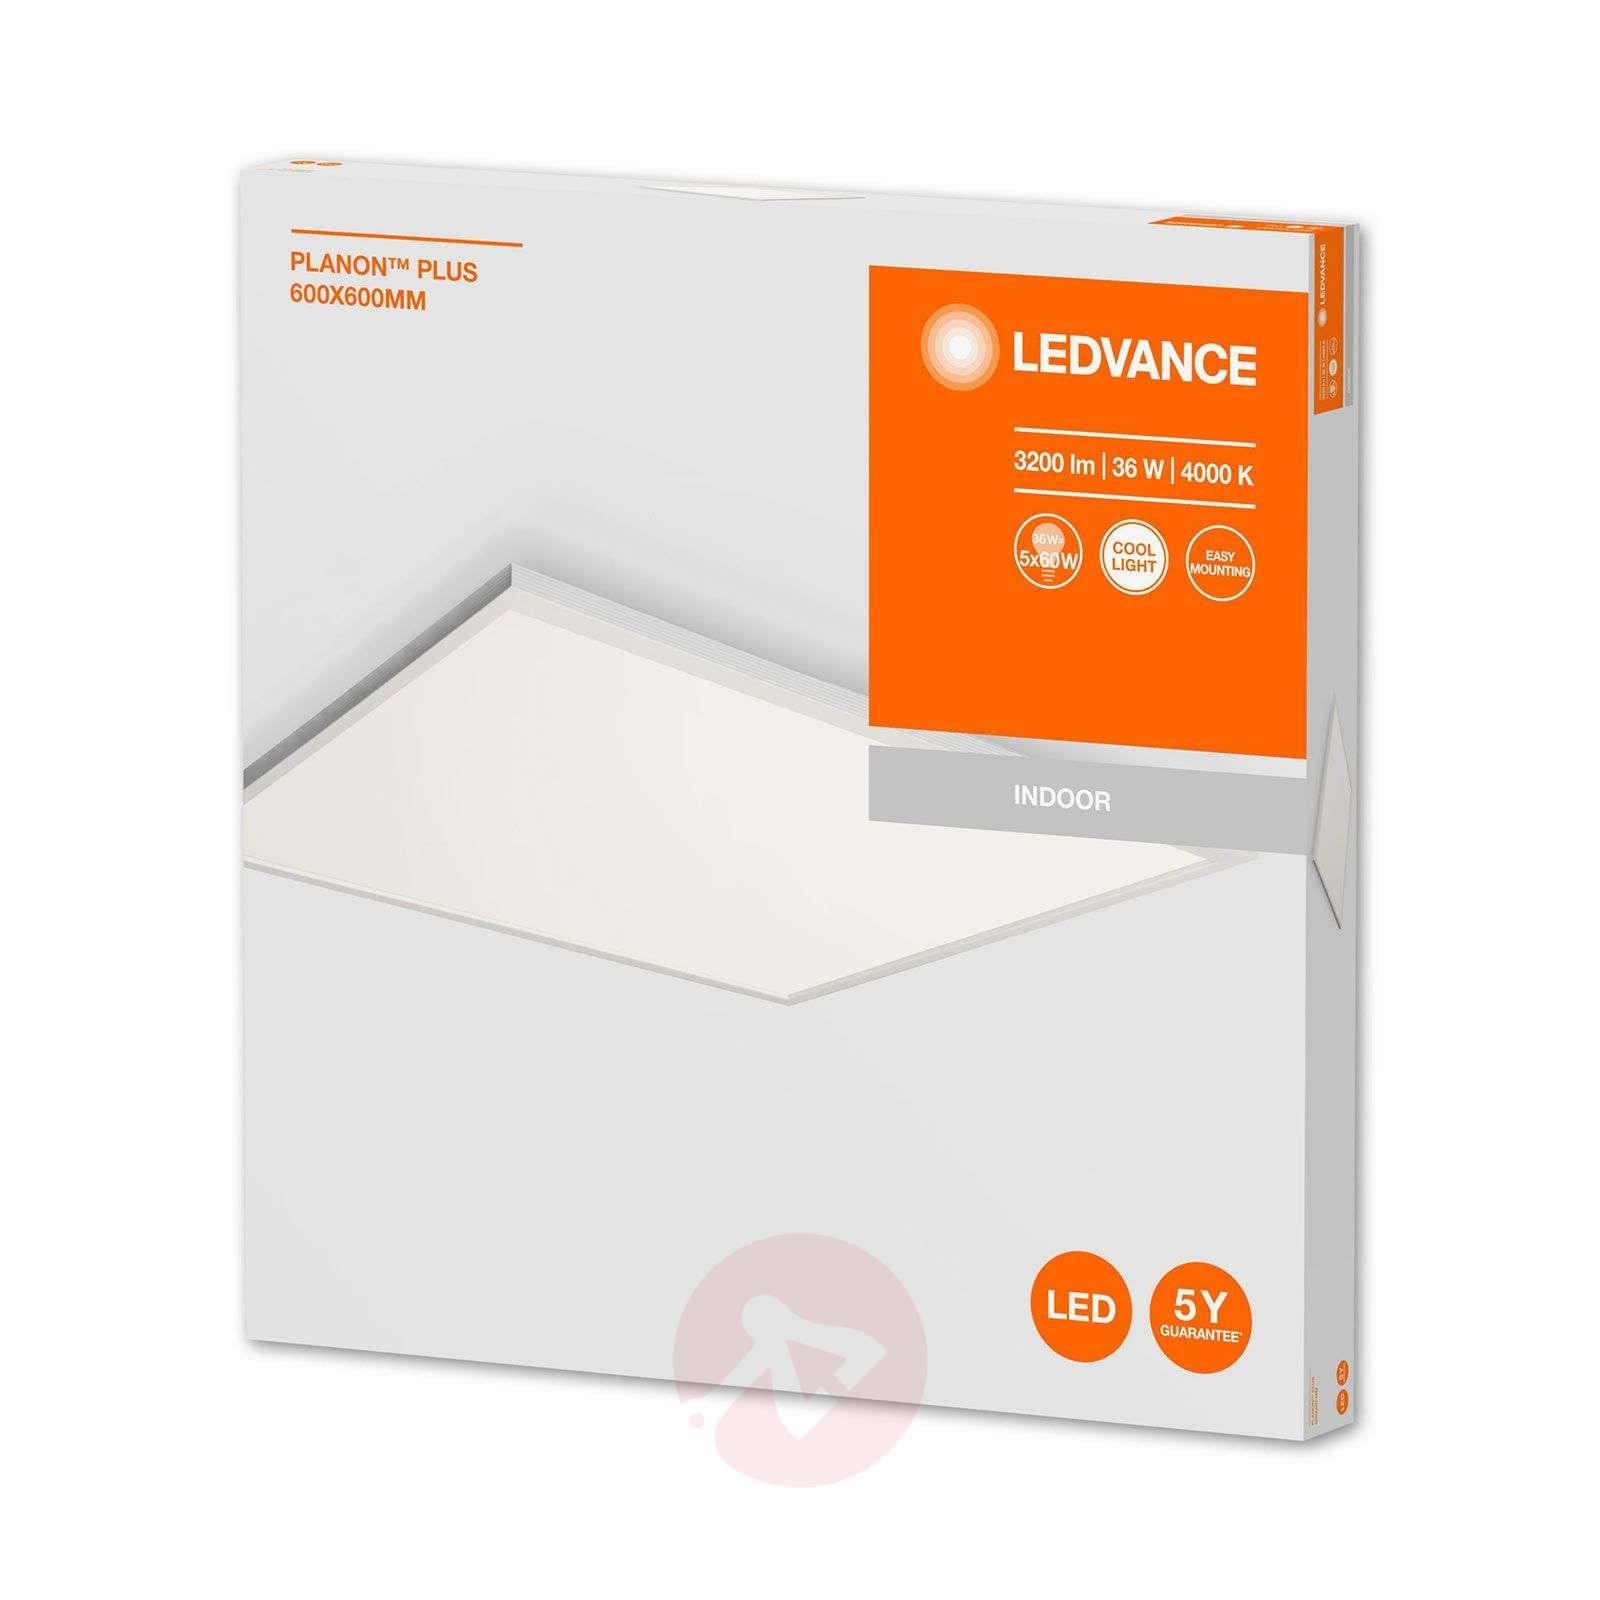 LEDVANCE Planon Plus LED panel 60cm 840 36W-6106023-01